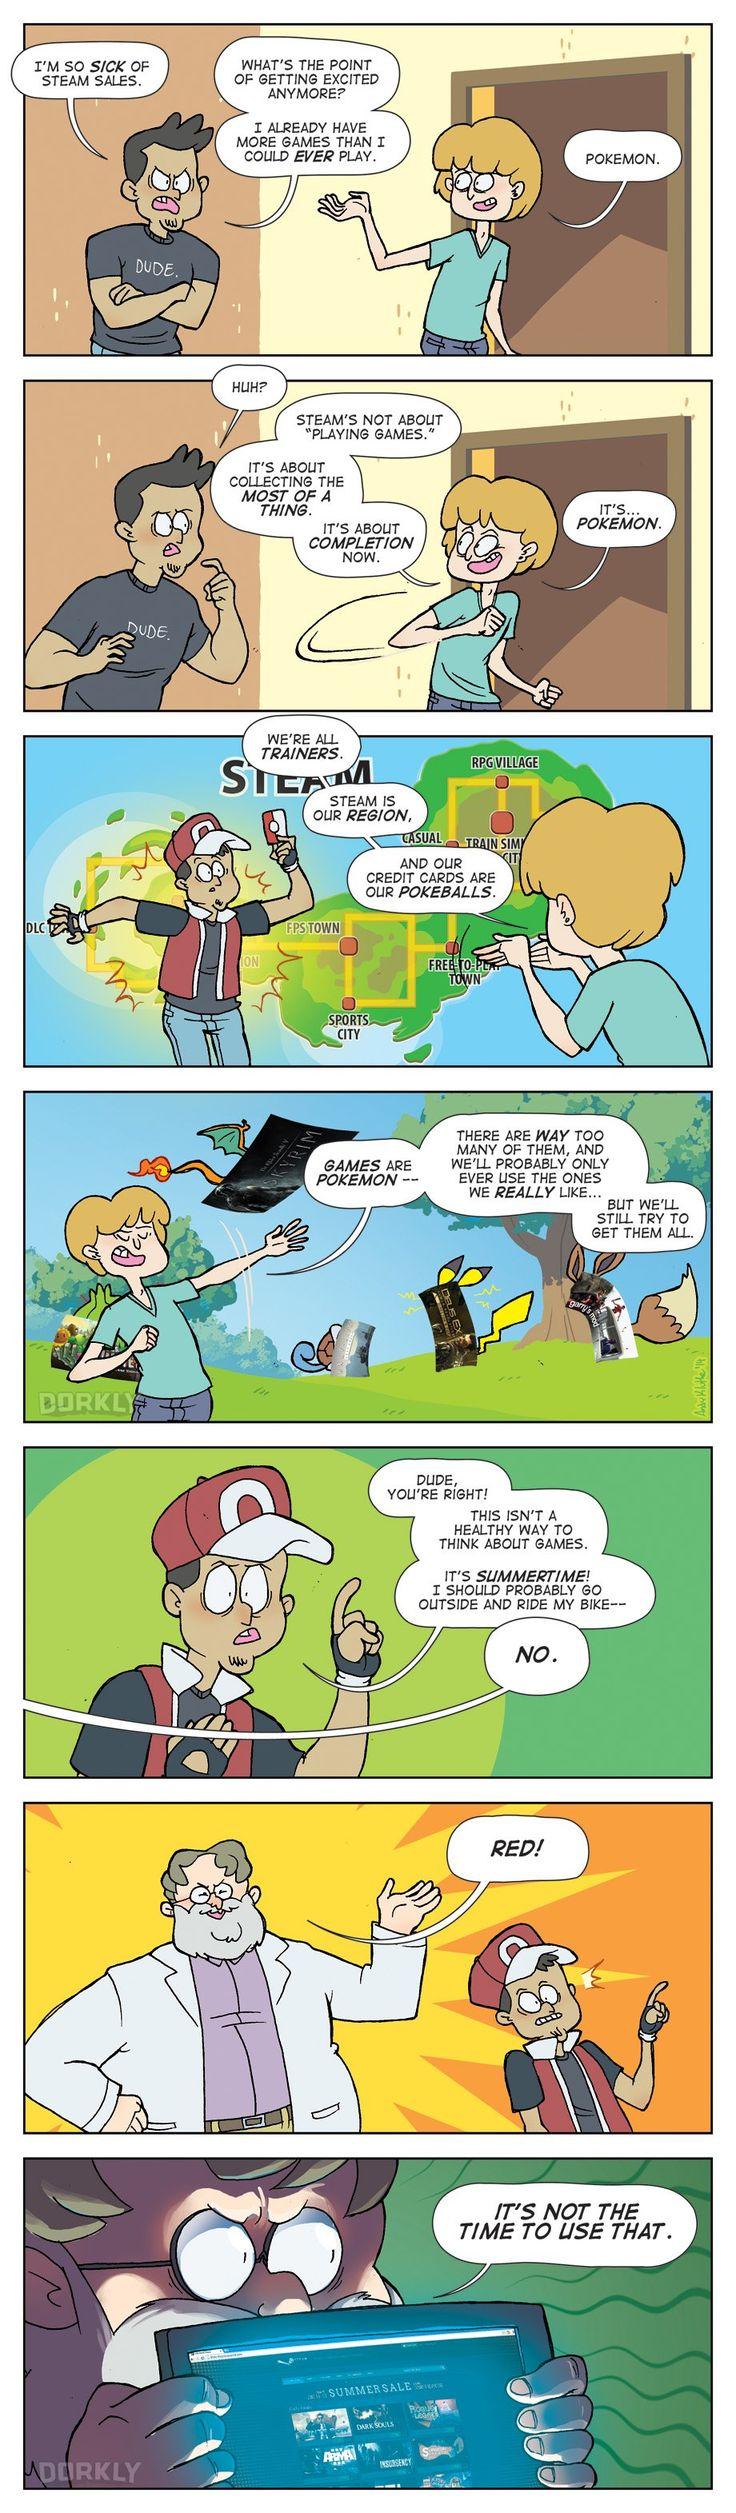 """The True Purpose of Steam Sales"" #dorkly #geek #steamsale"